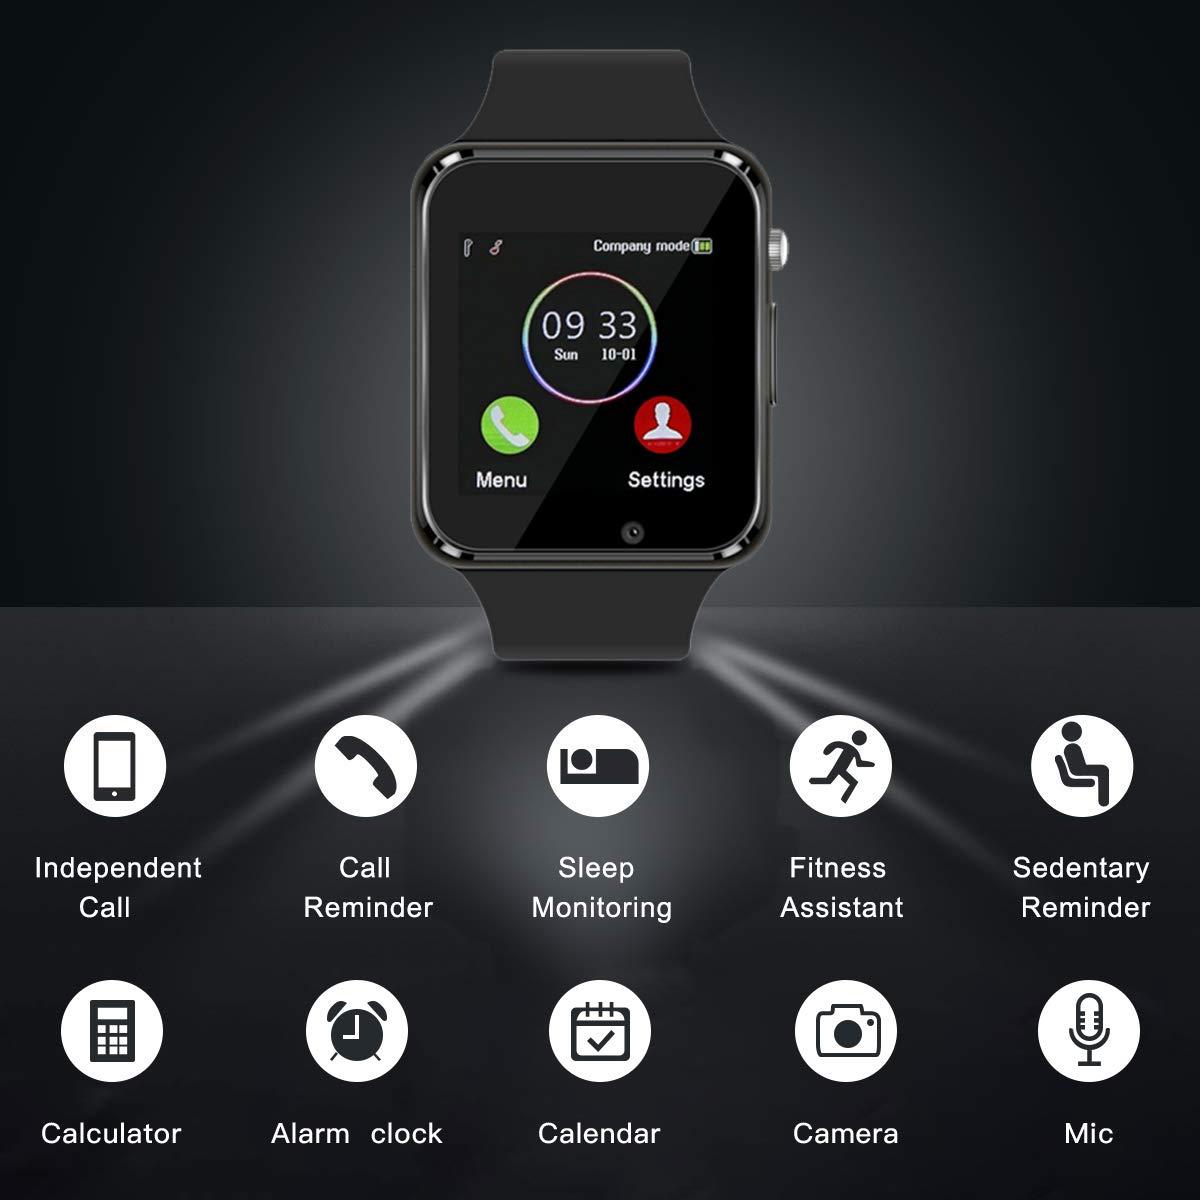 Smart Watch Bluetooth Fitness Tracker, Qidoou Android iOS Compatible Smartwatch of SIM SD Card Slot, Waterproof Pedometer Sleep Calorie Monitor Call/Message Music Clock for Kids Men Women (Black) by Qidoou (Image #4)